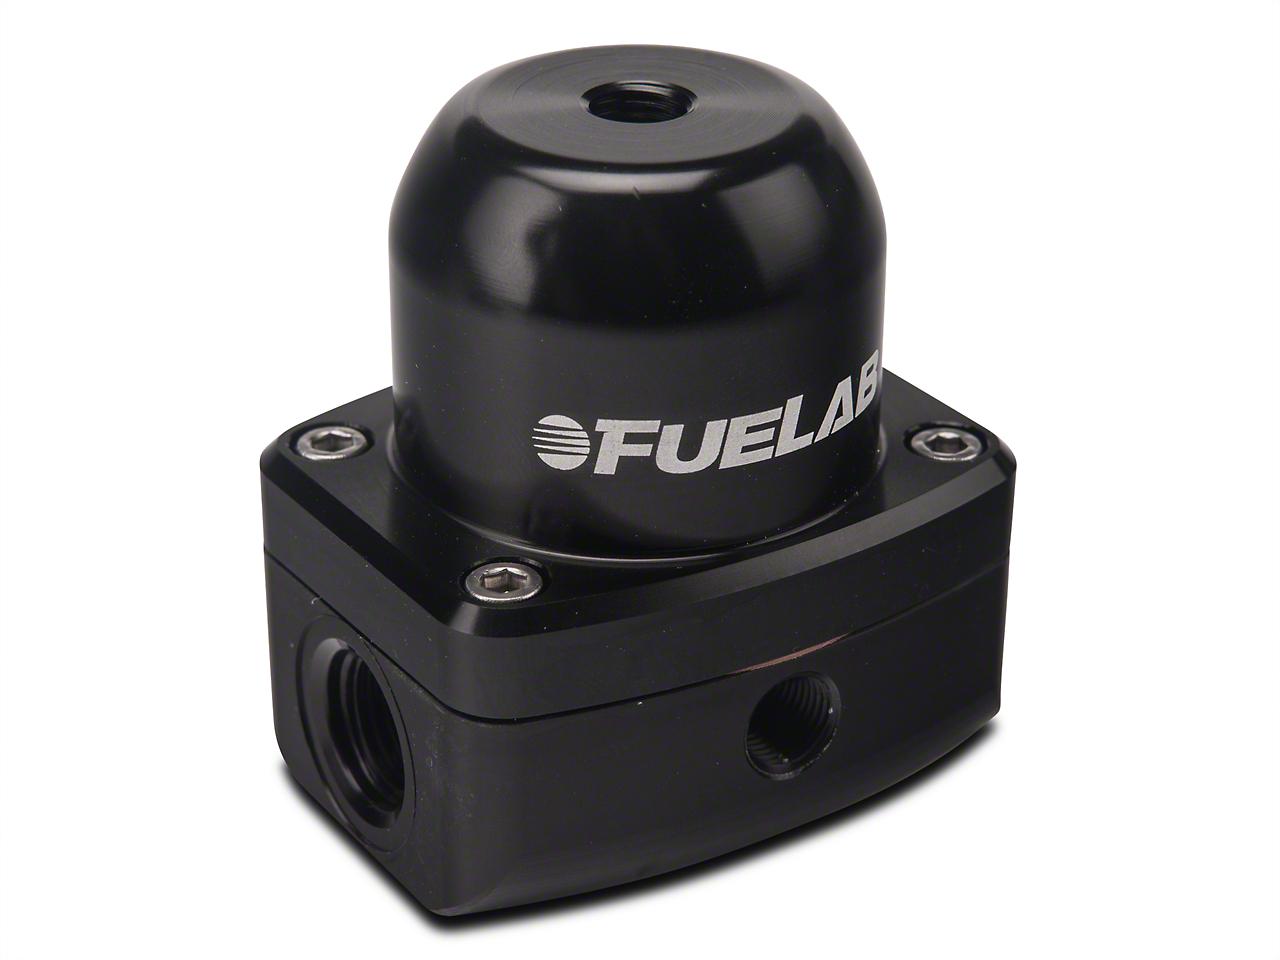 Fuelab 515 Series Adjustable Fuel Pressure Regulator - 6AN (86-14 All)